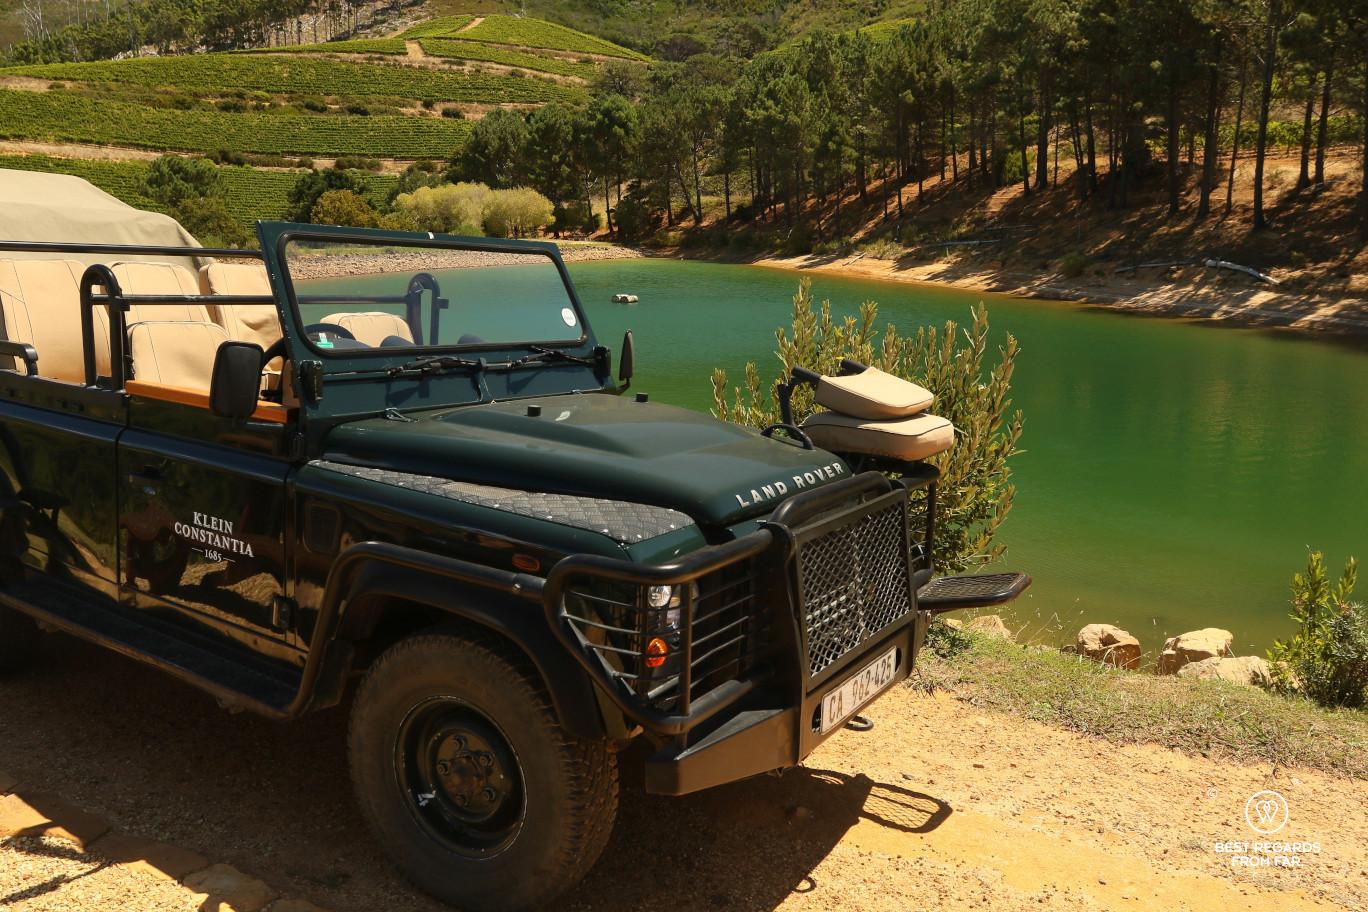 Klein Constantia wine safari with a Land Rover in the vineyard, Constantia wine route, Cape Town